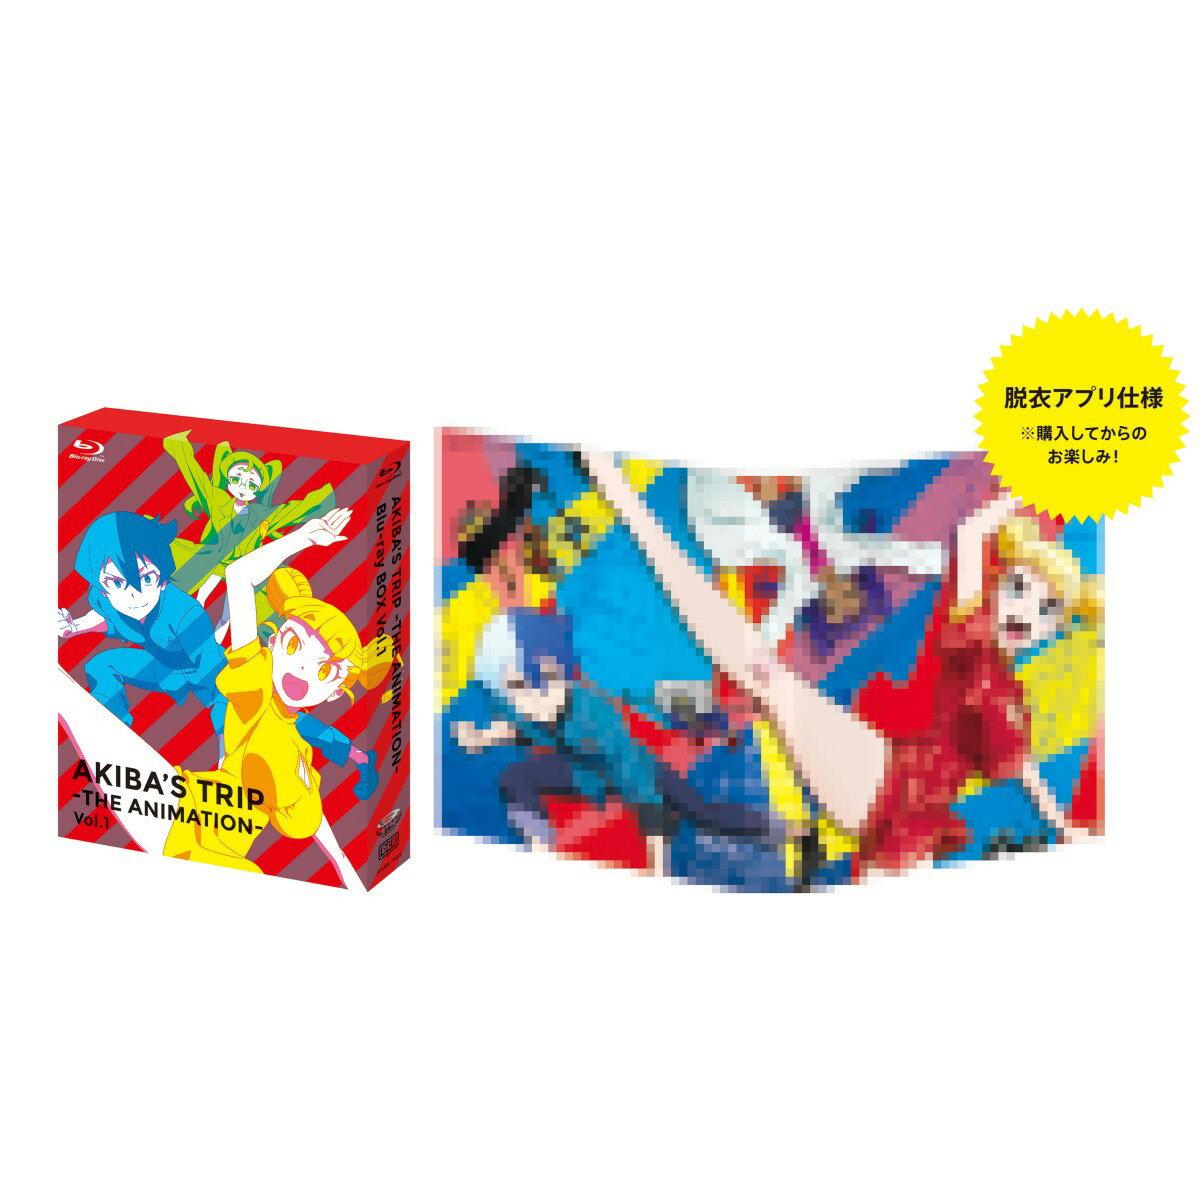 「AKIBA'S TRIP -THE ANIMATION-」Blu-rayボックス Vol.1【Blu-ray】画像